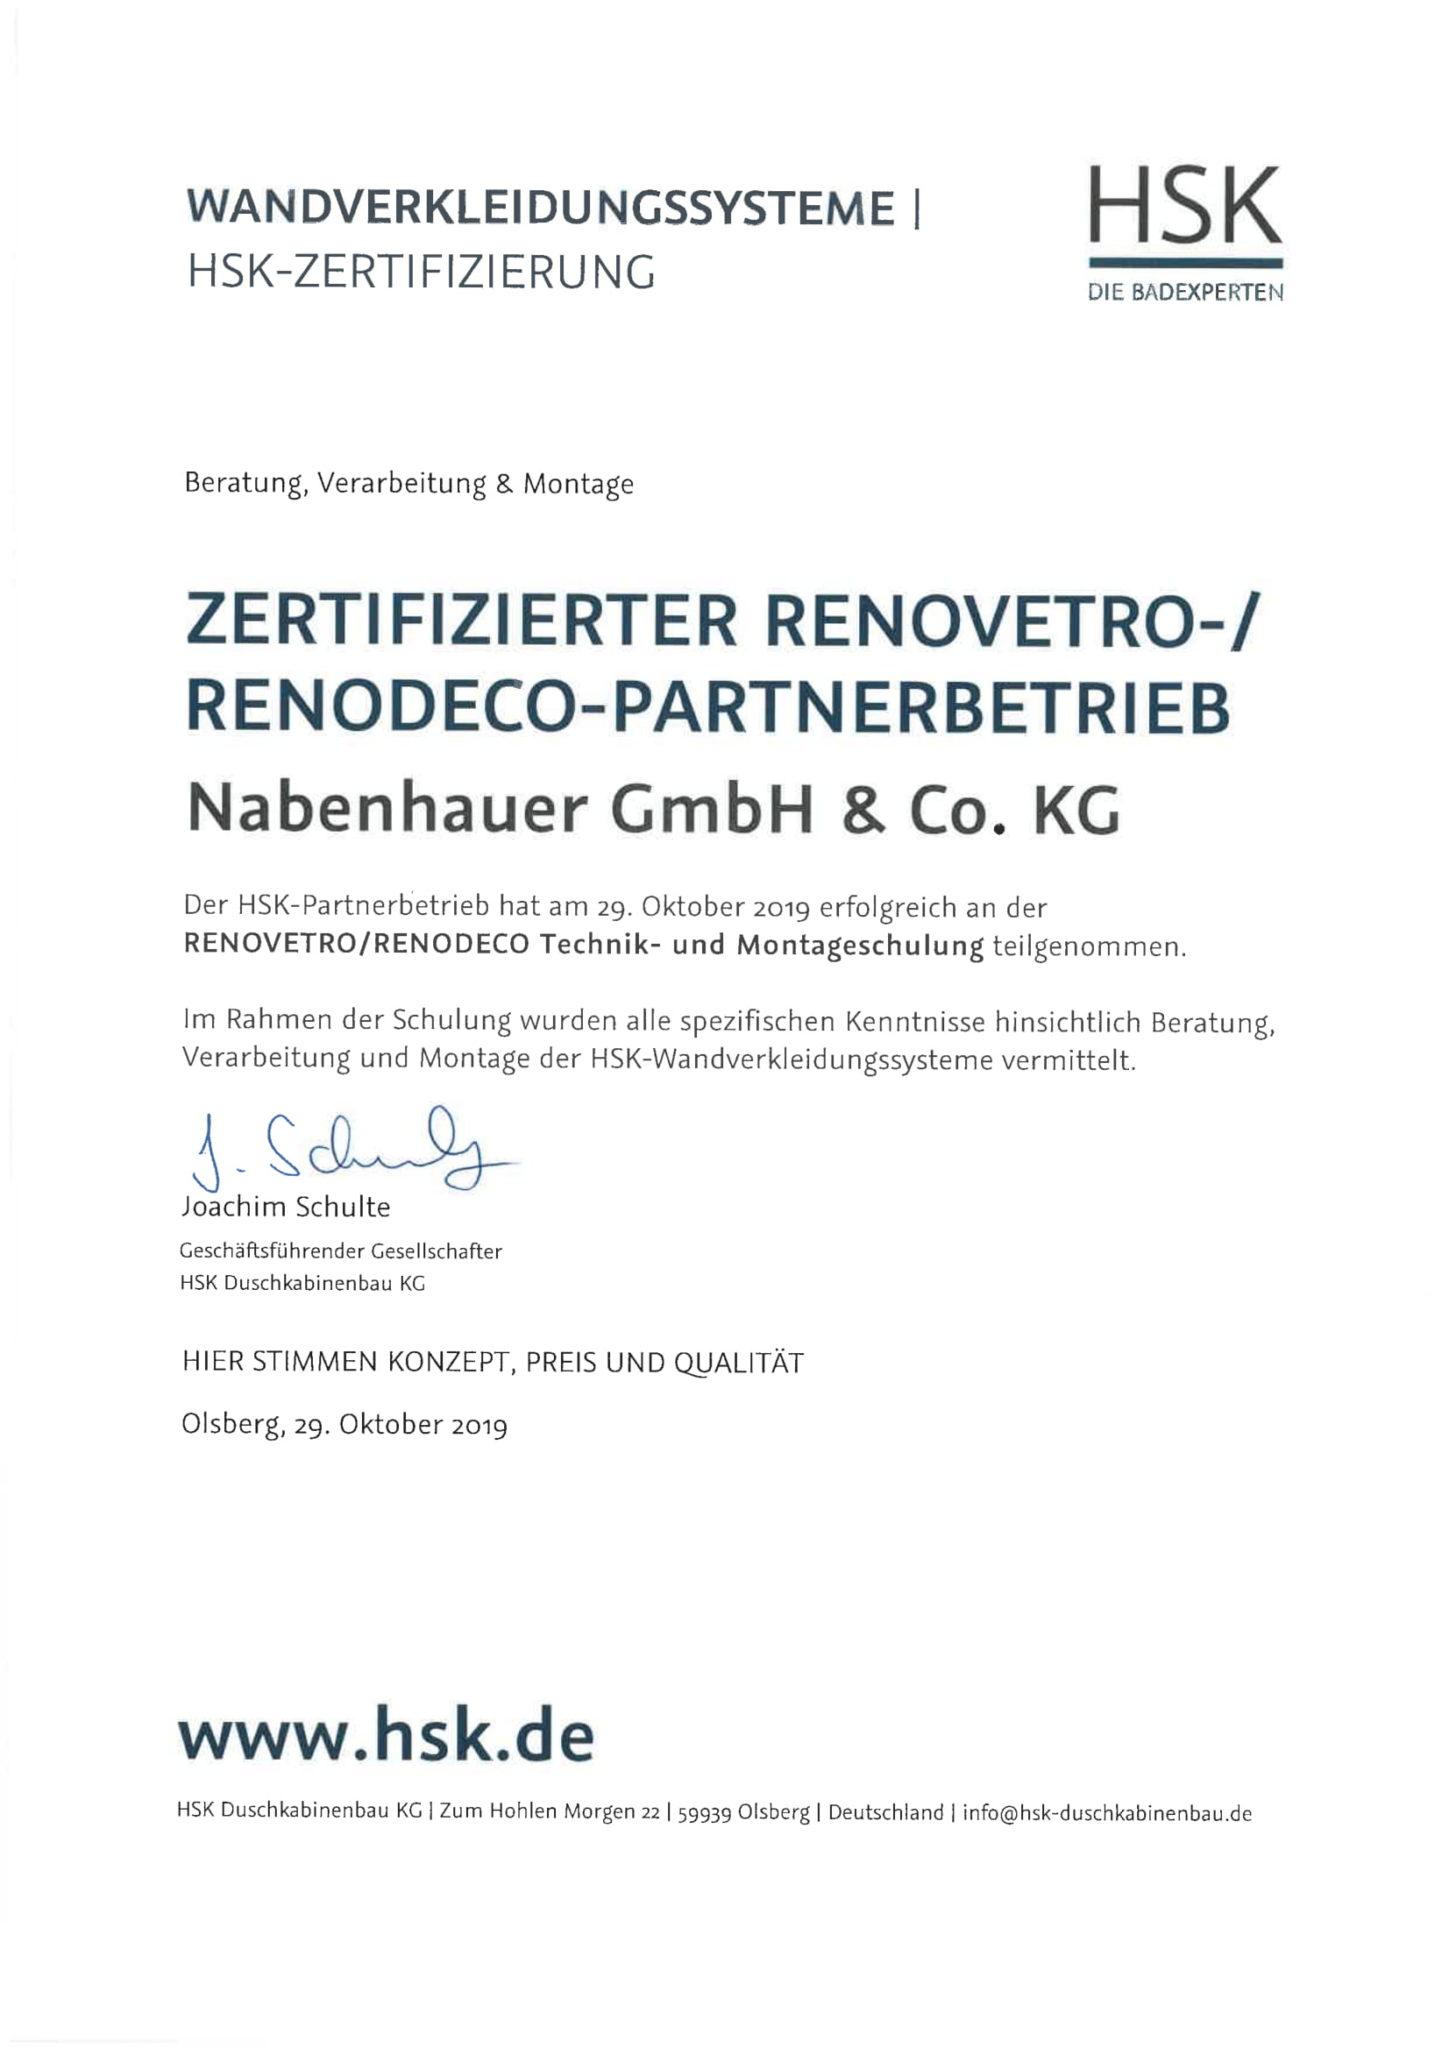 Zertifizierter Renovetro Renodeco Partnerbetrieb